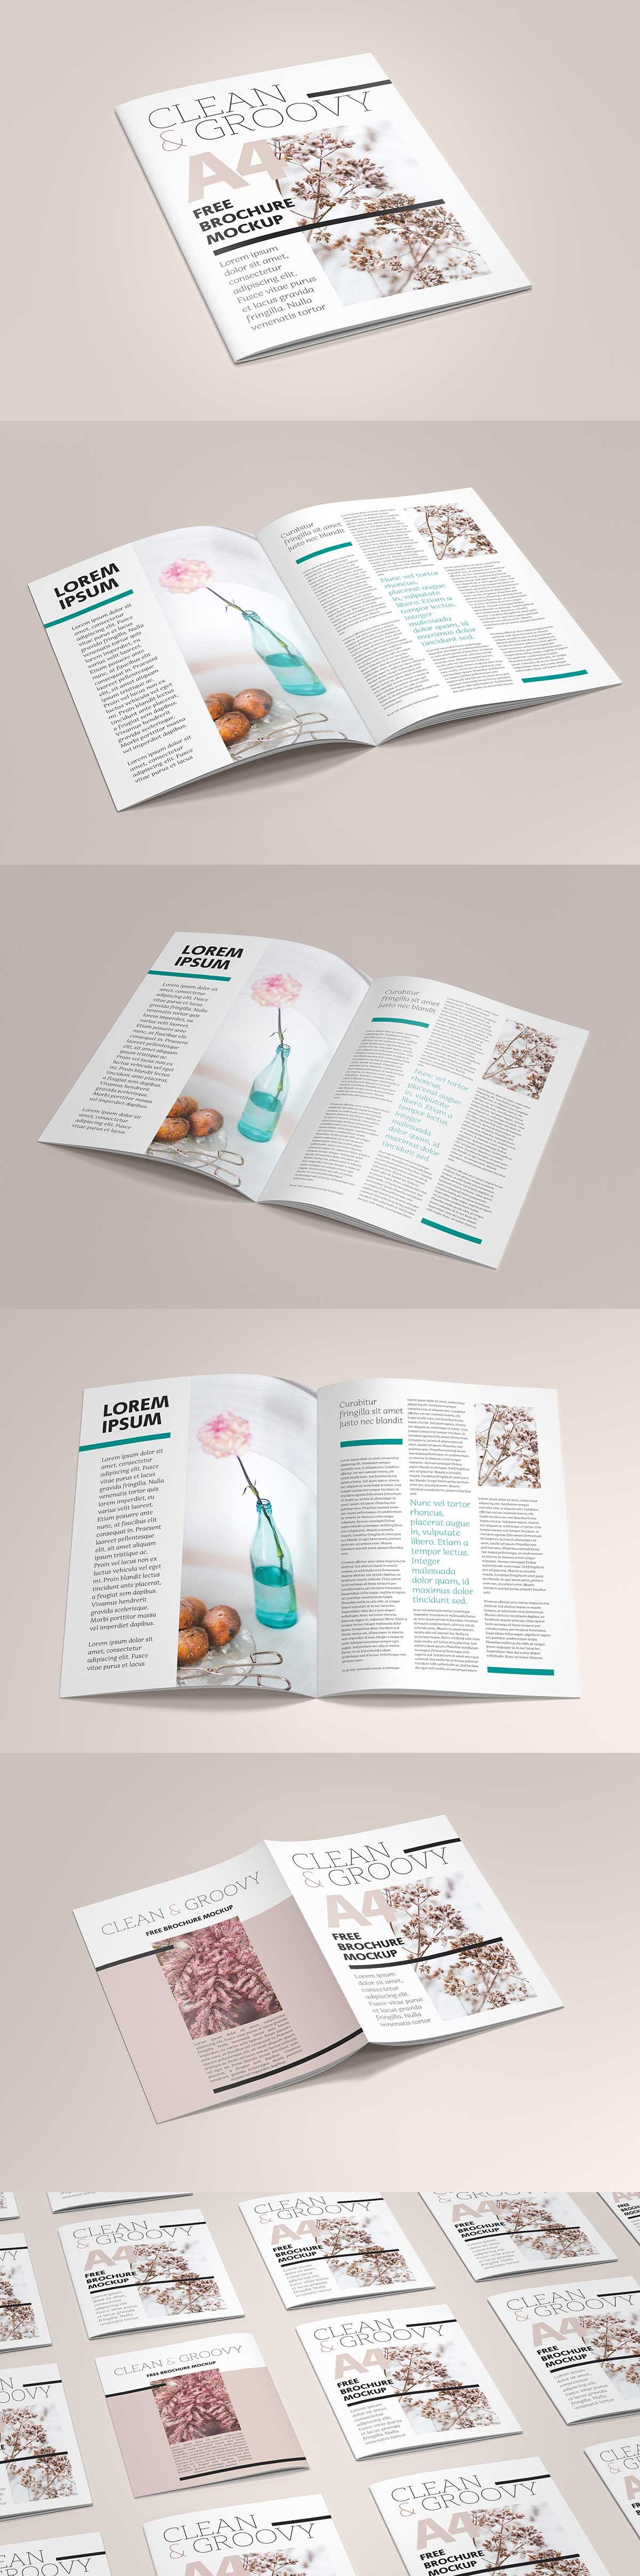 Free-A4-brochure-Catalog-mockup